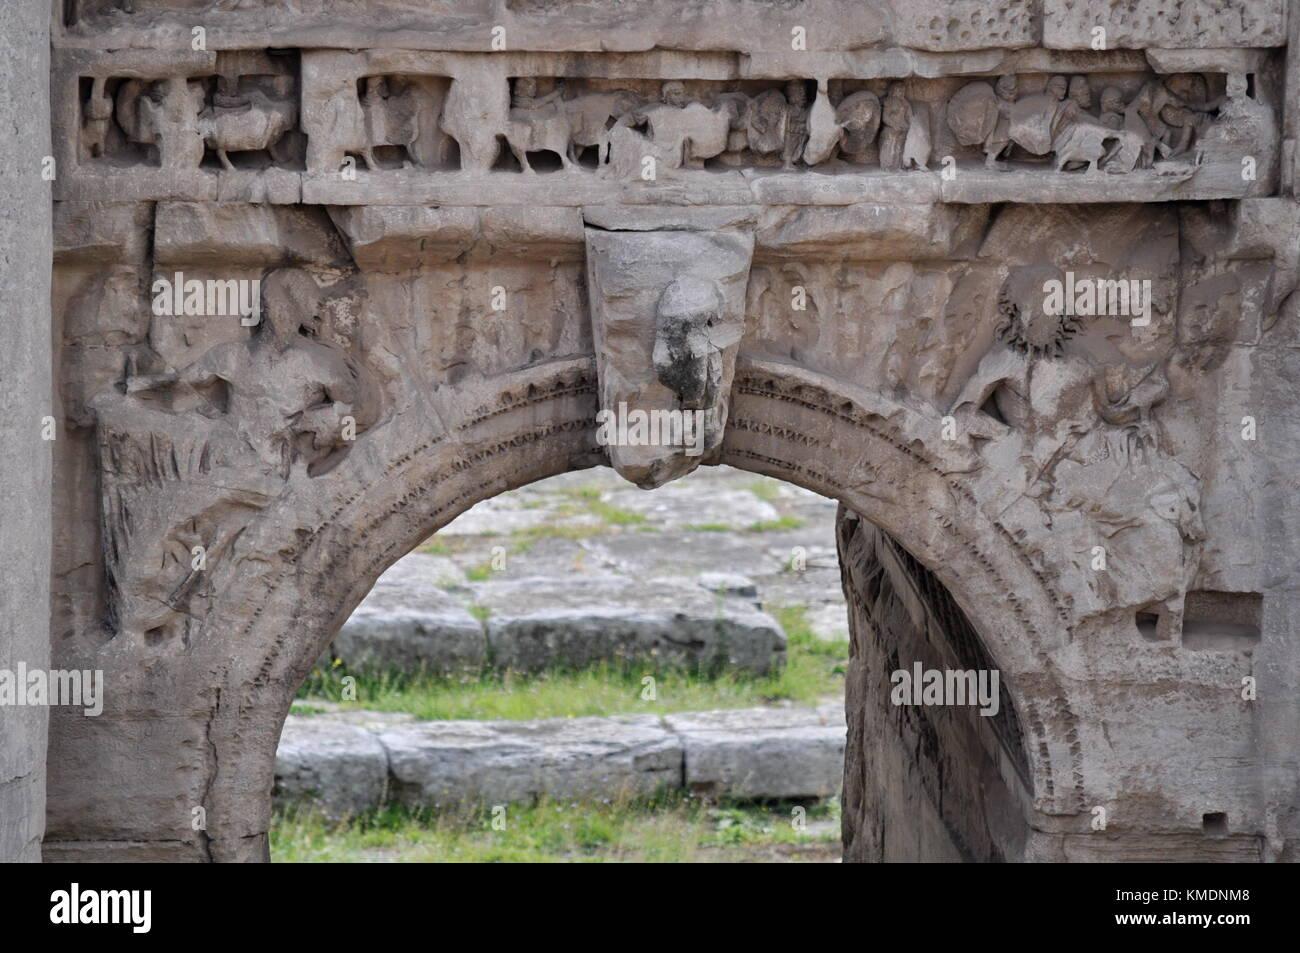 Triumphal Arch of Septimius Severus in the Roman Forum, Italy - Stock Image